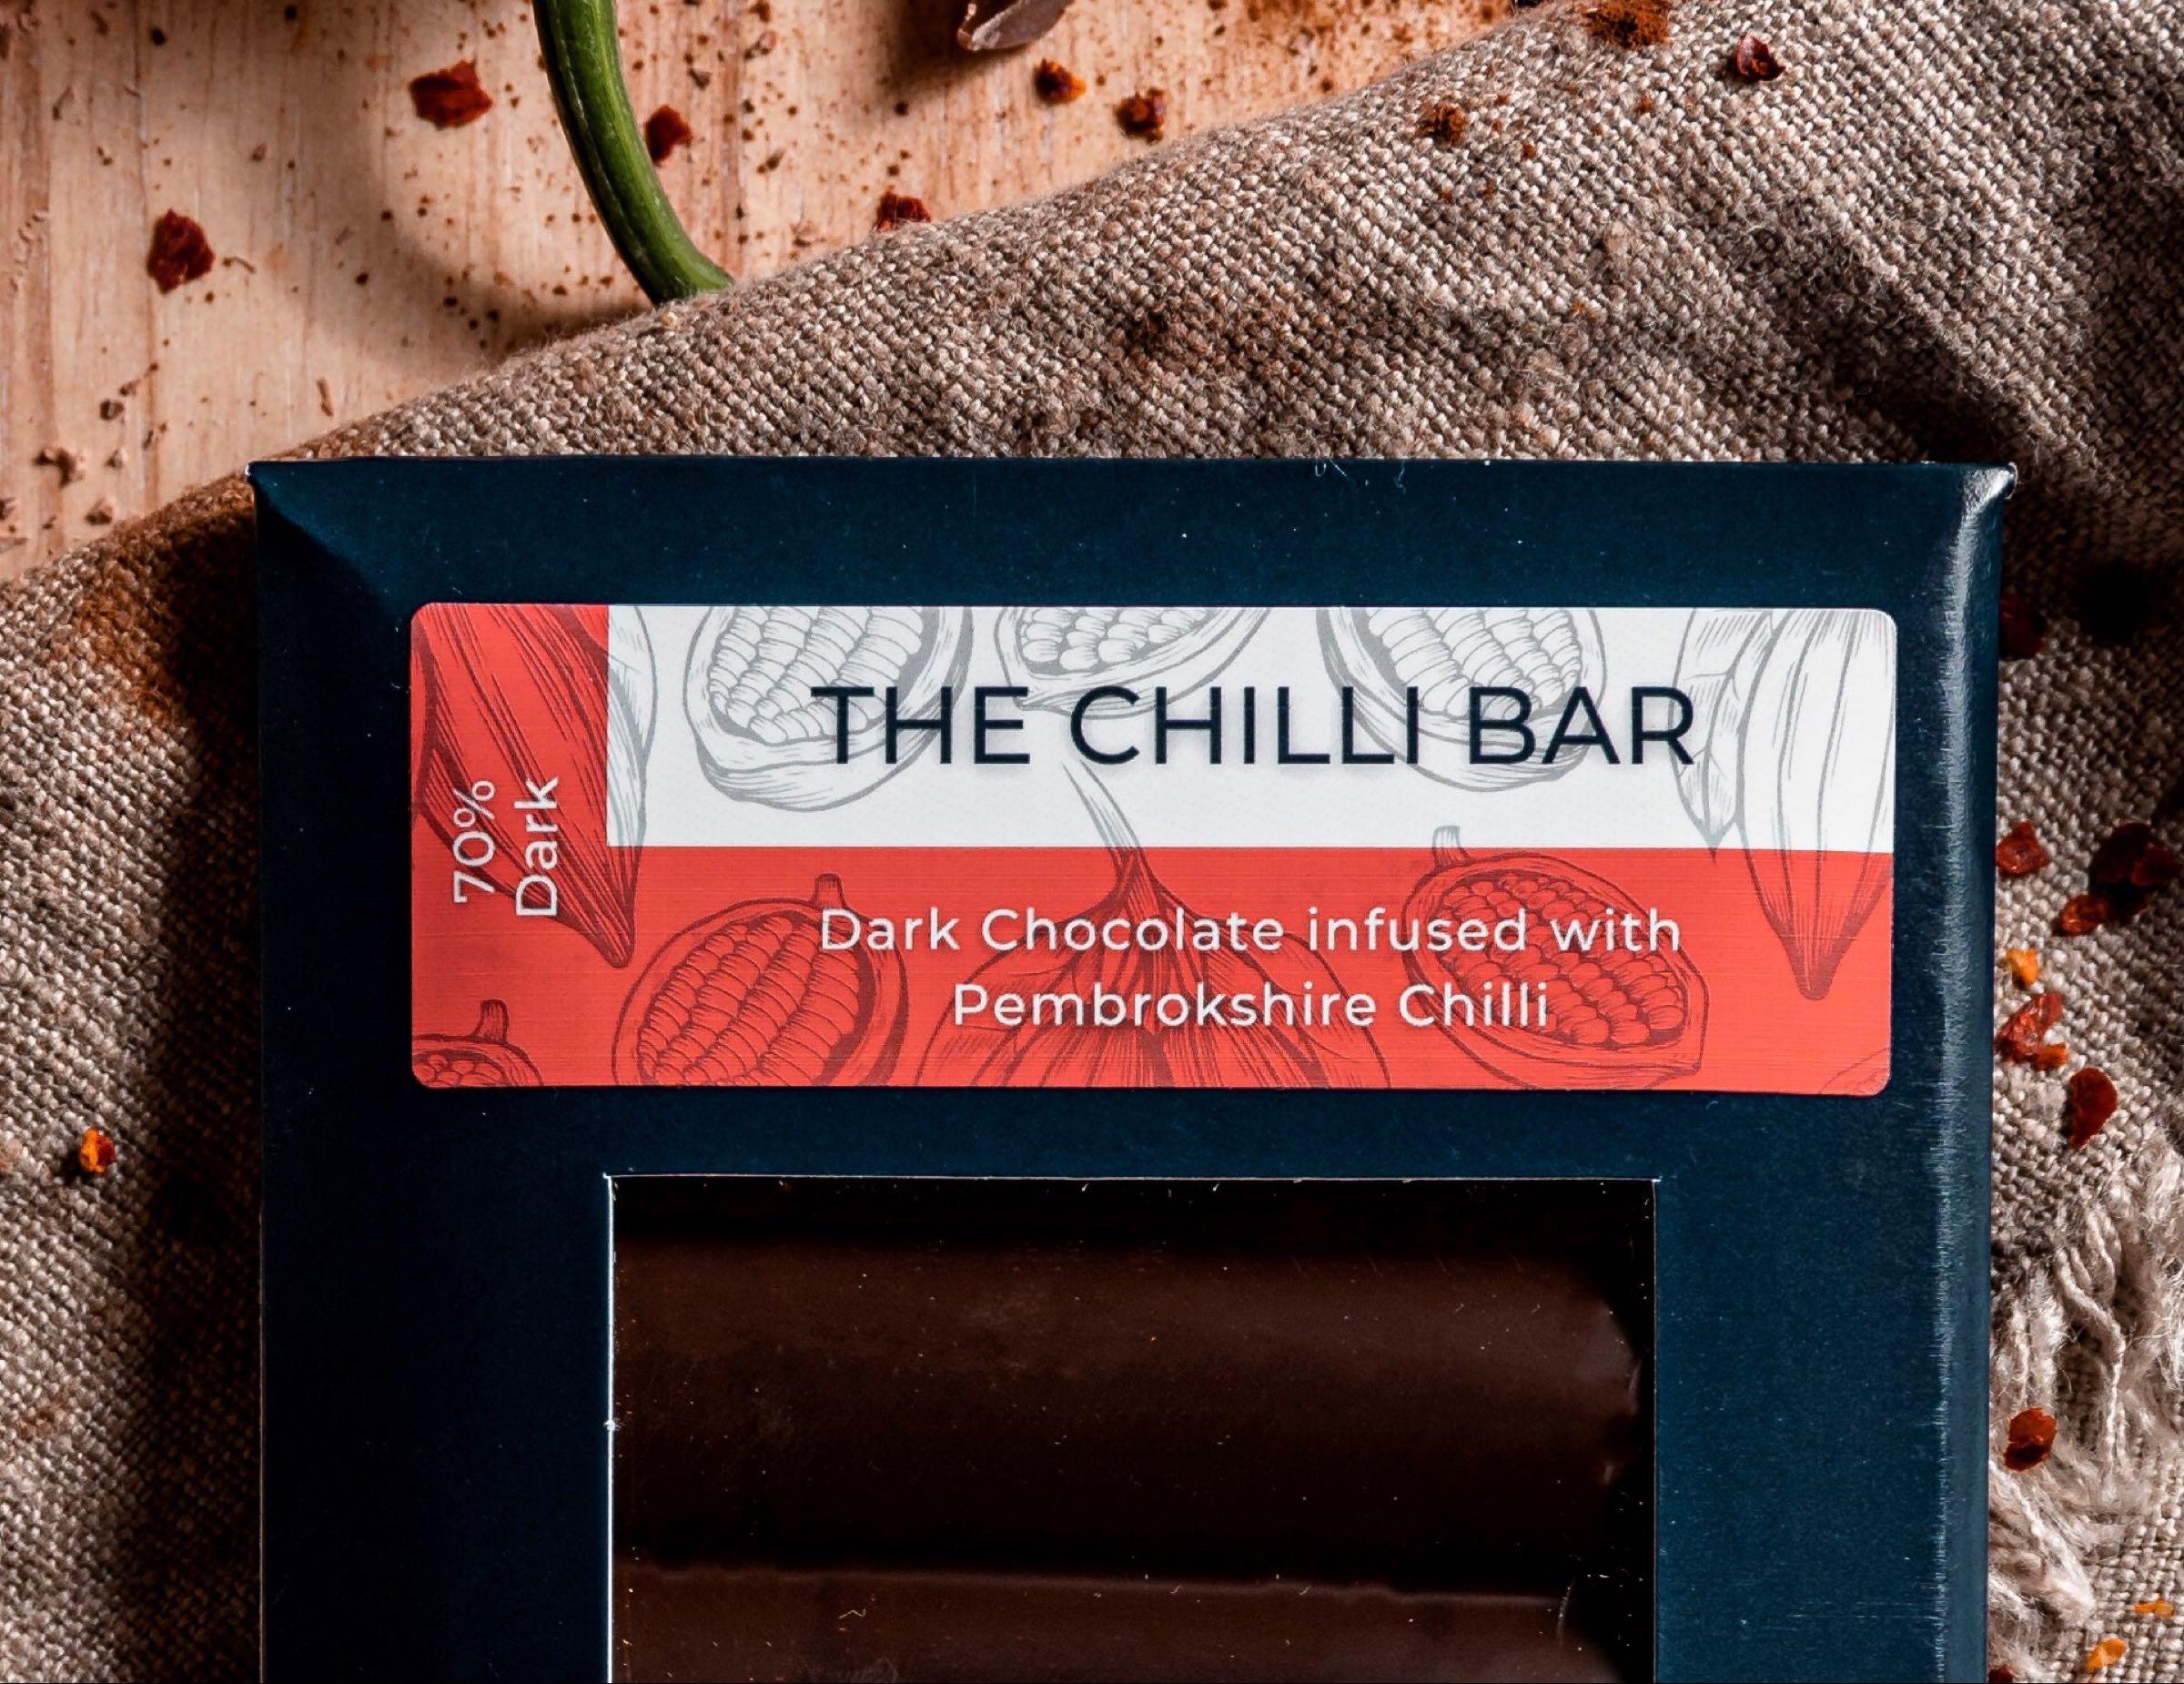 70% Dark Chocolate and Pembrokeshire Chilli